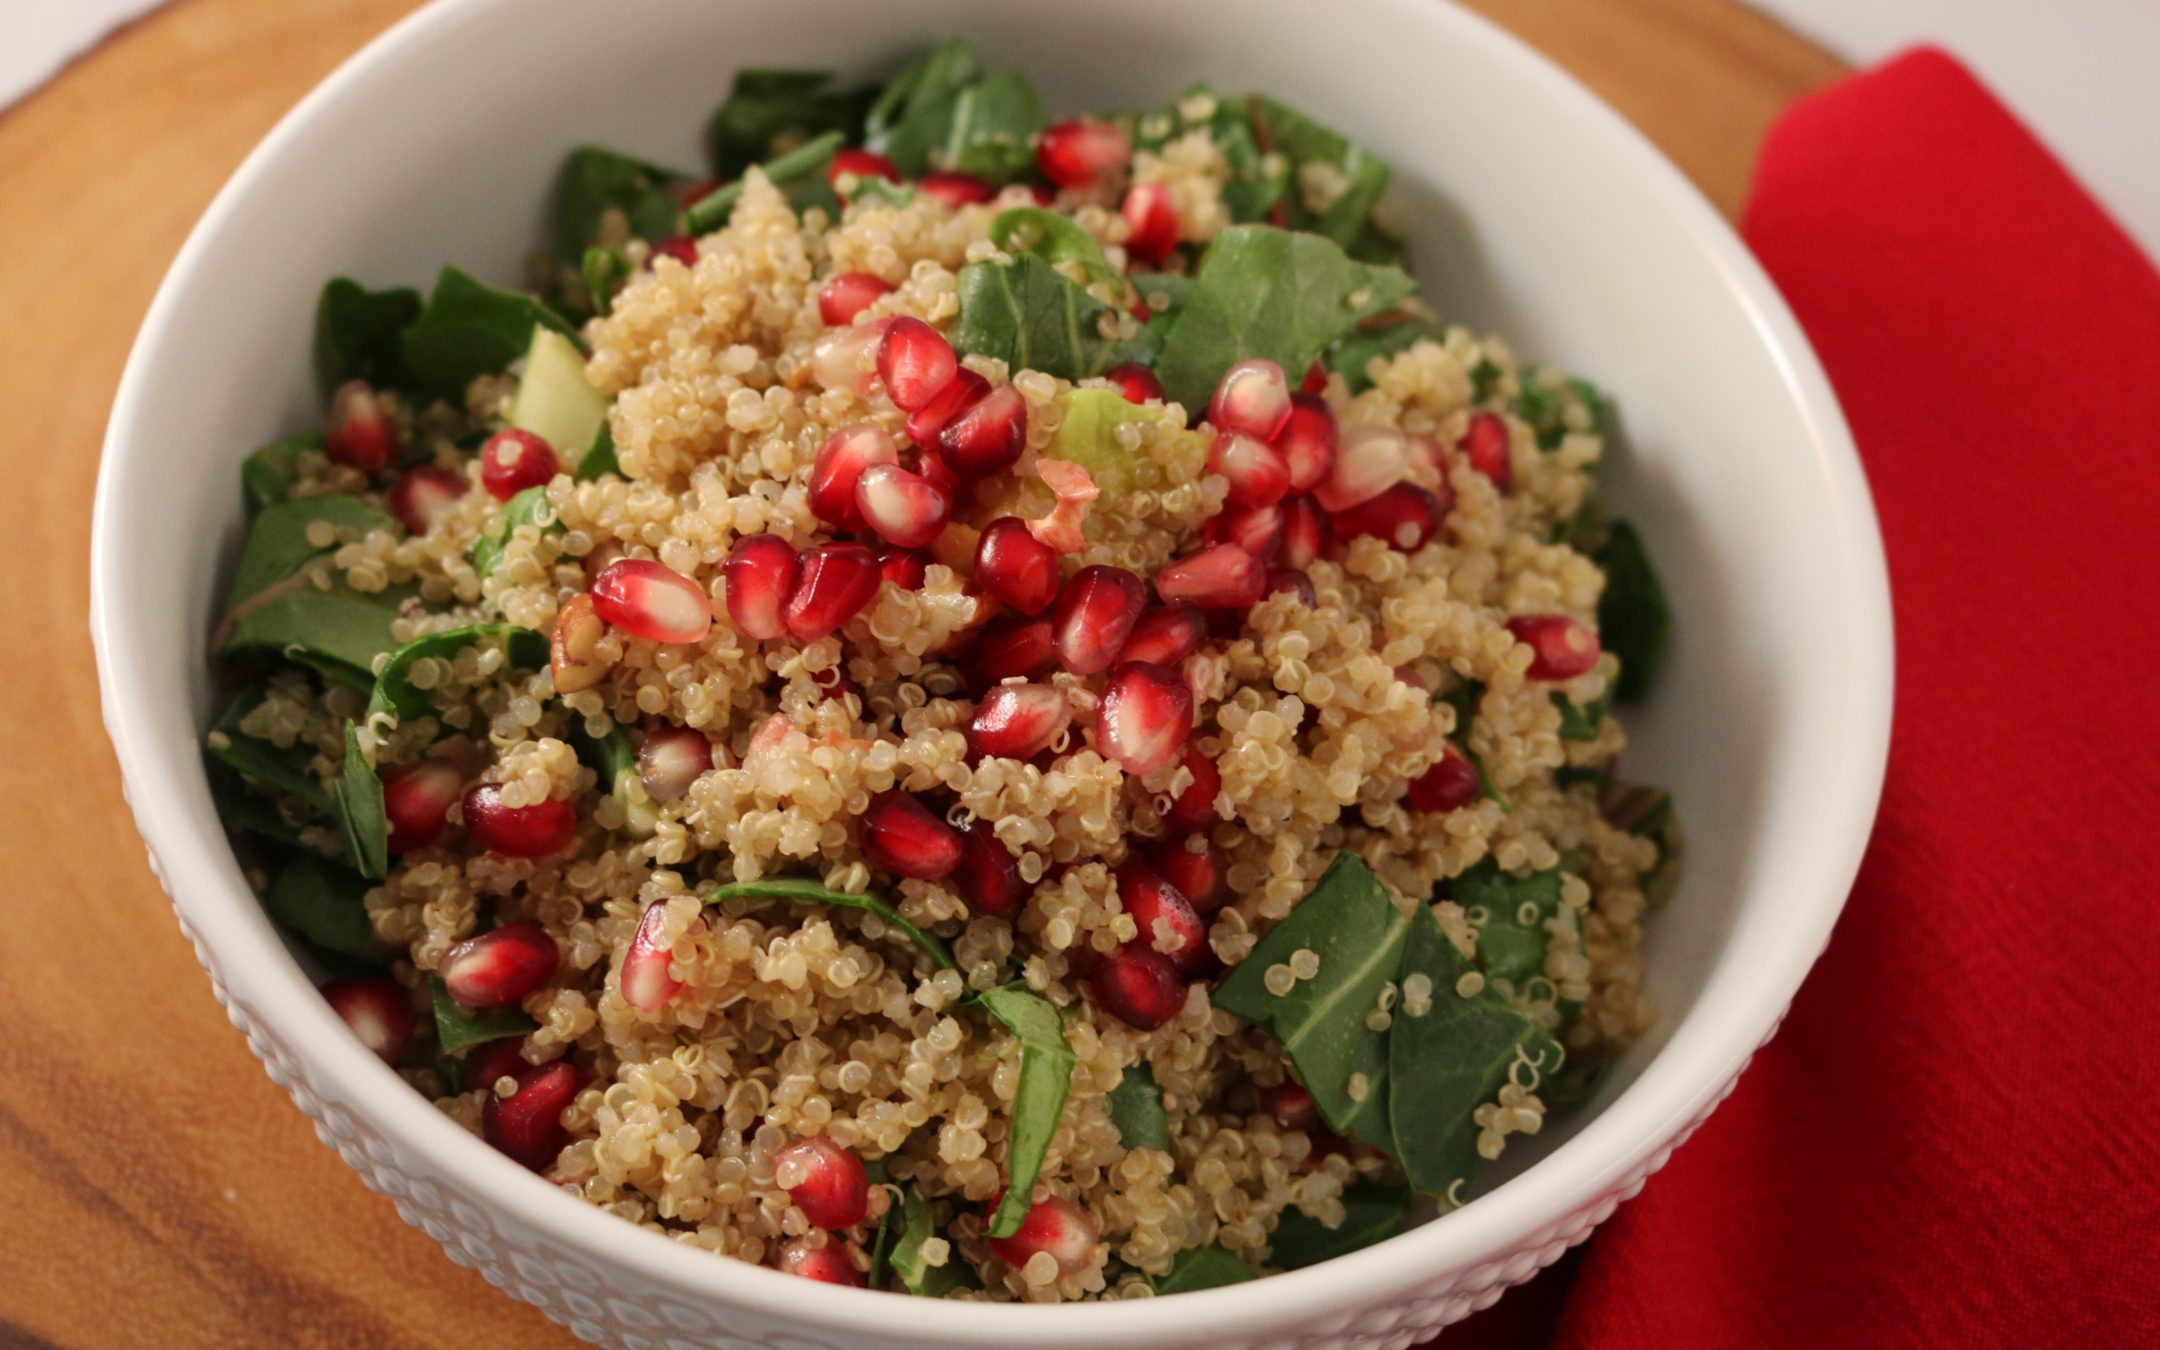 Pomegranate Avocado Quinoa Salad (Vegan, Gluten-Free)